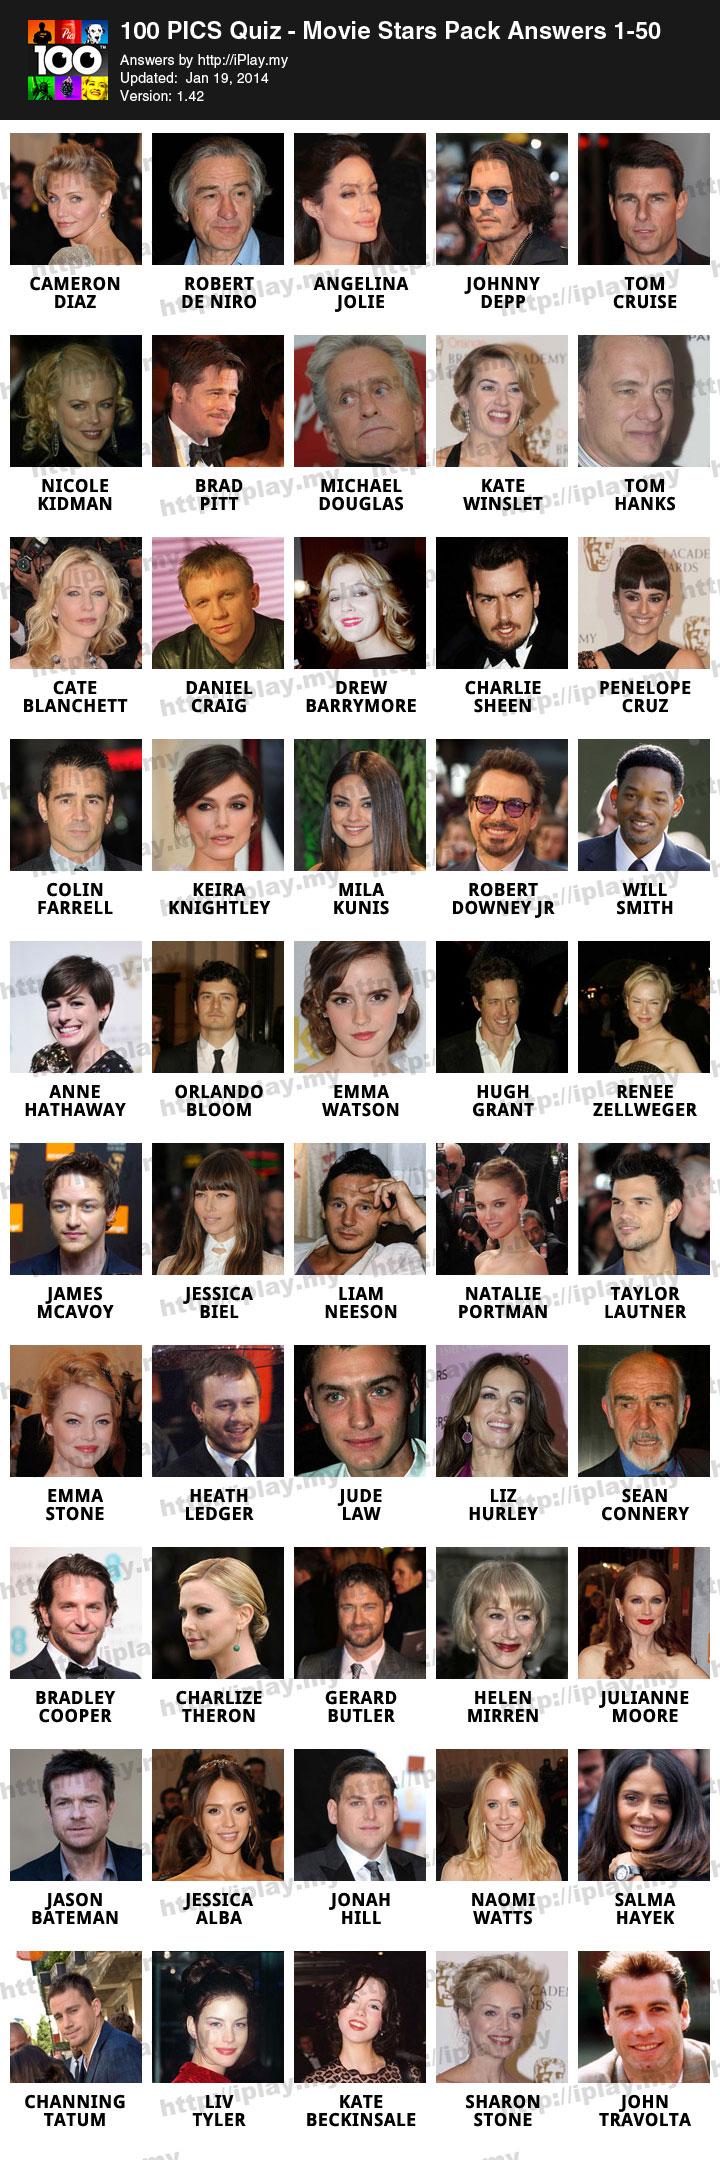 100 Pics Answers Movie Stars : answers, movie, stars, Movie, Stars, Answers, IPlay.my